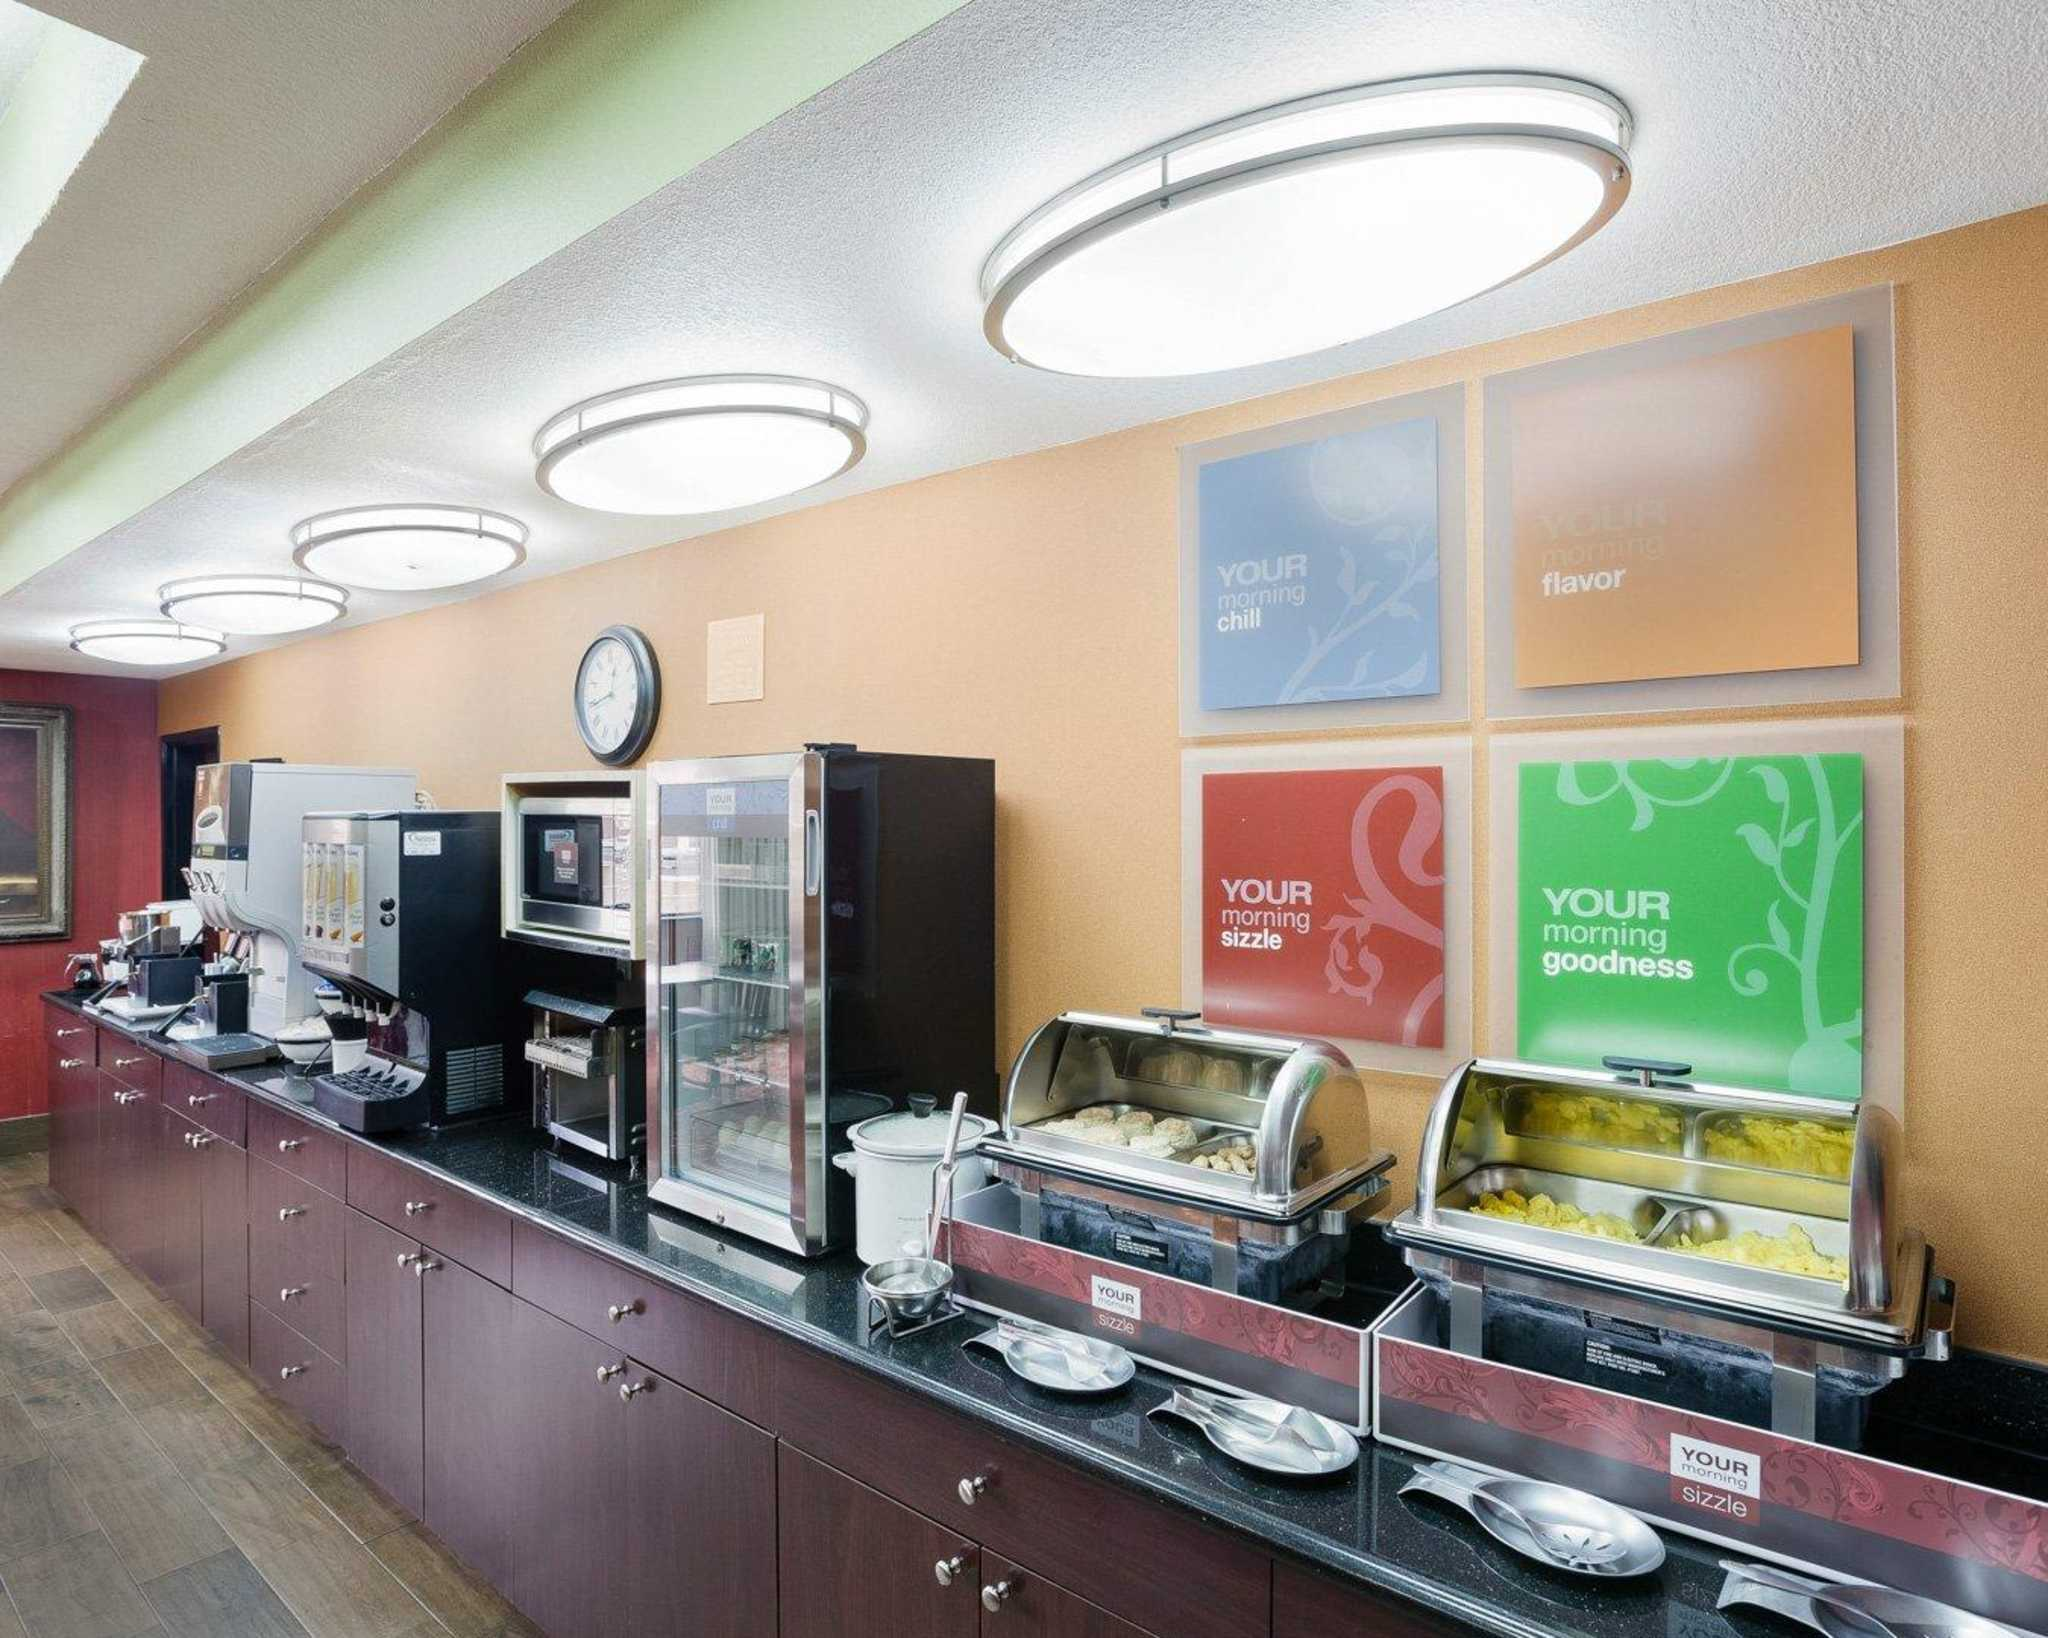 Comfort Inn & Suites Near Medical Center image 13